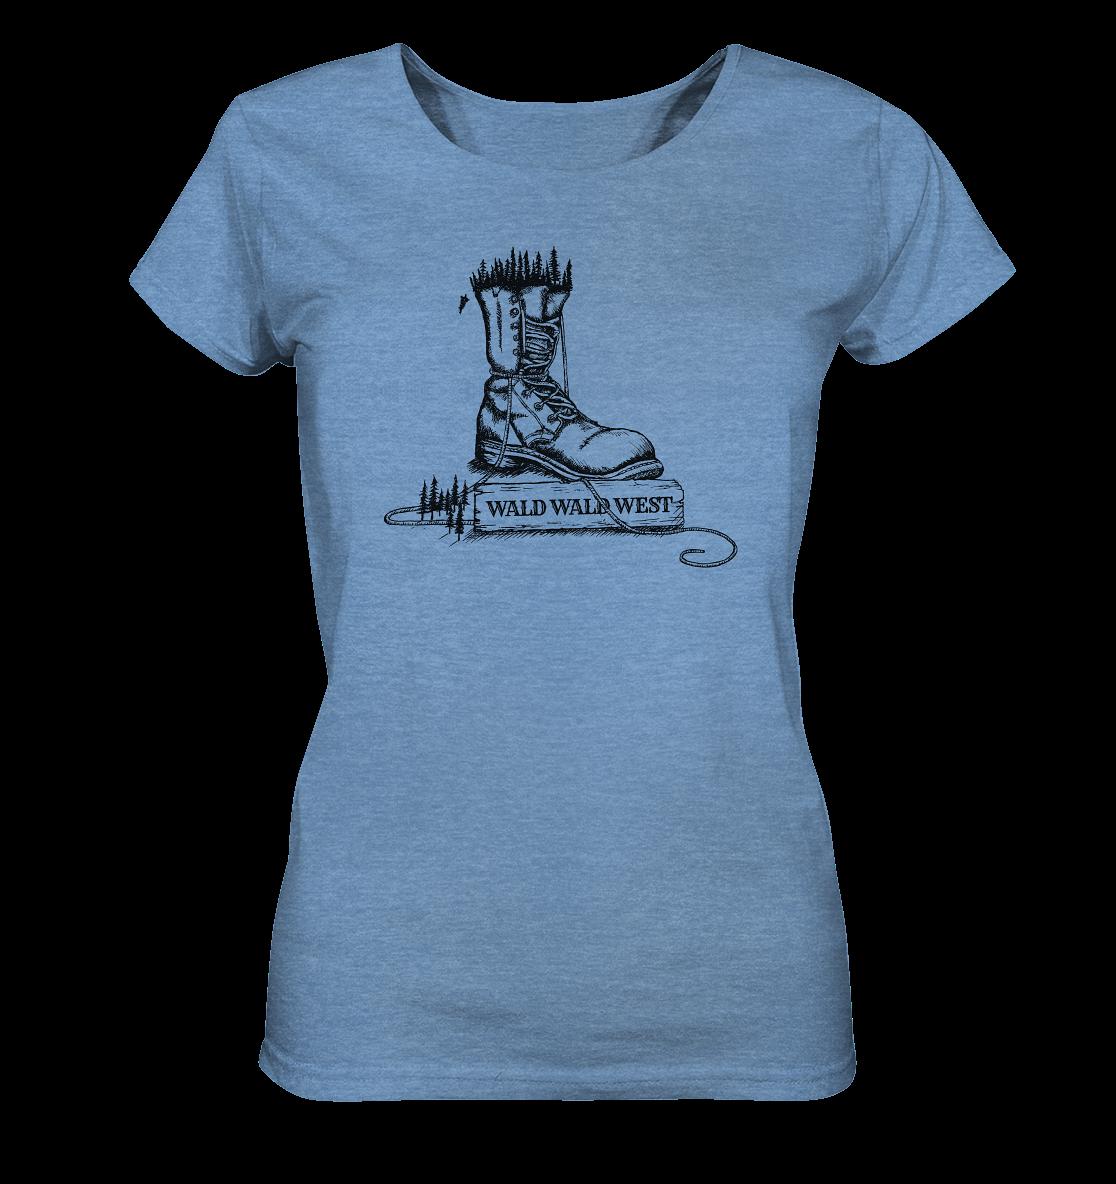 front-ladies-organic-shirt-meliert-6090c4-1116x.png